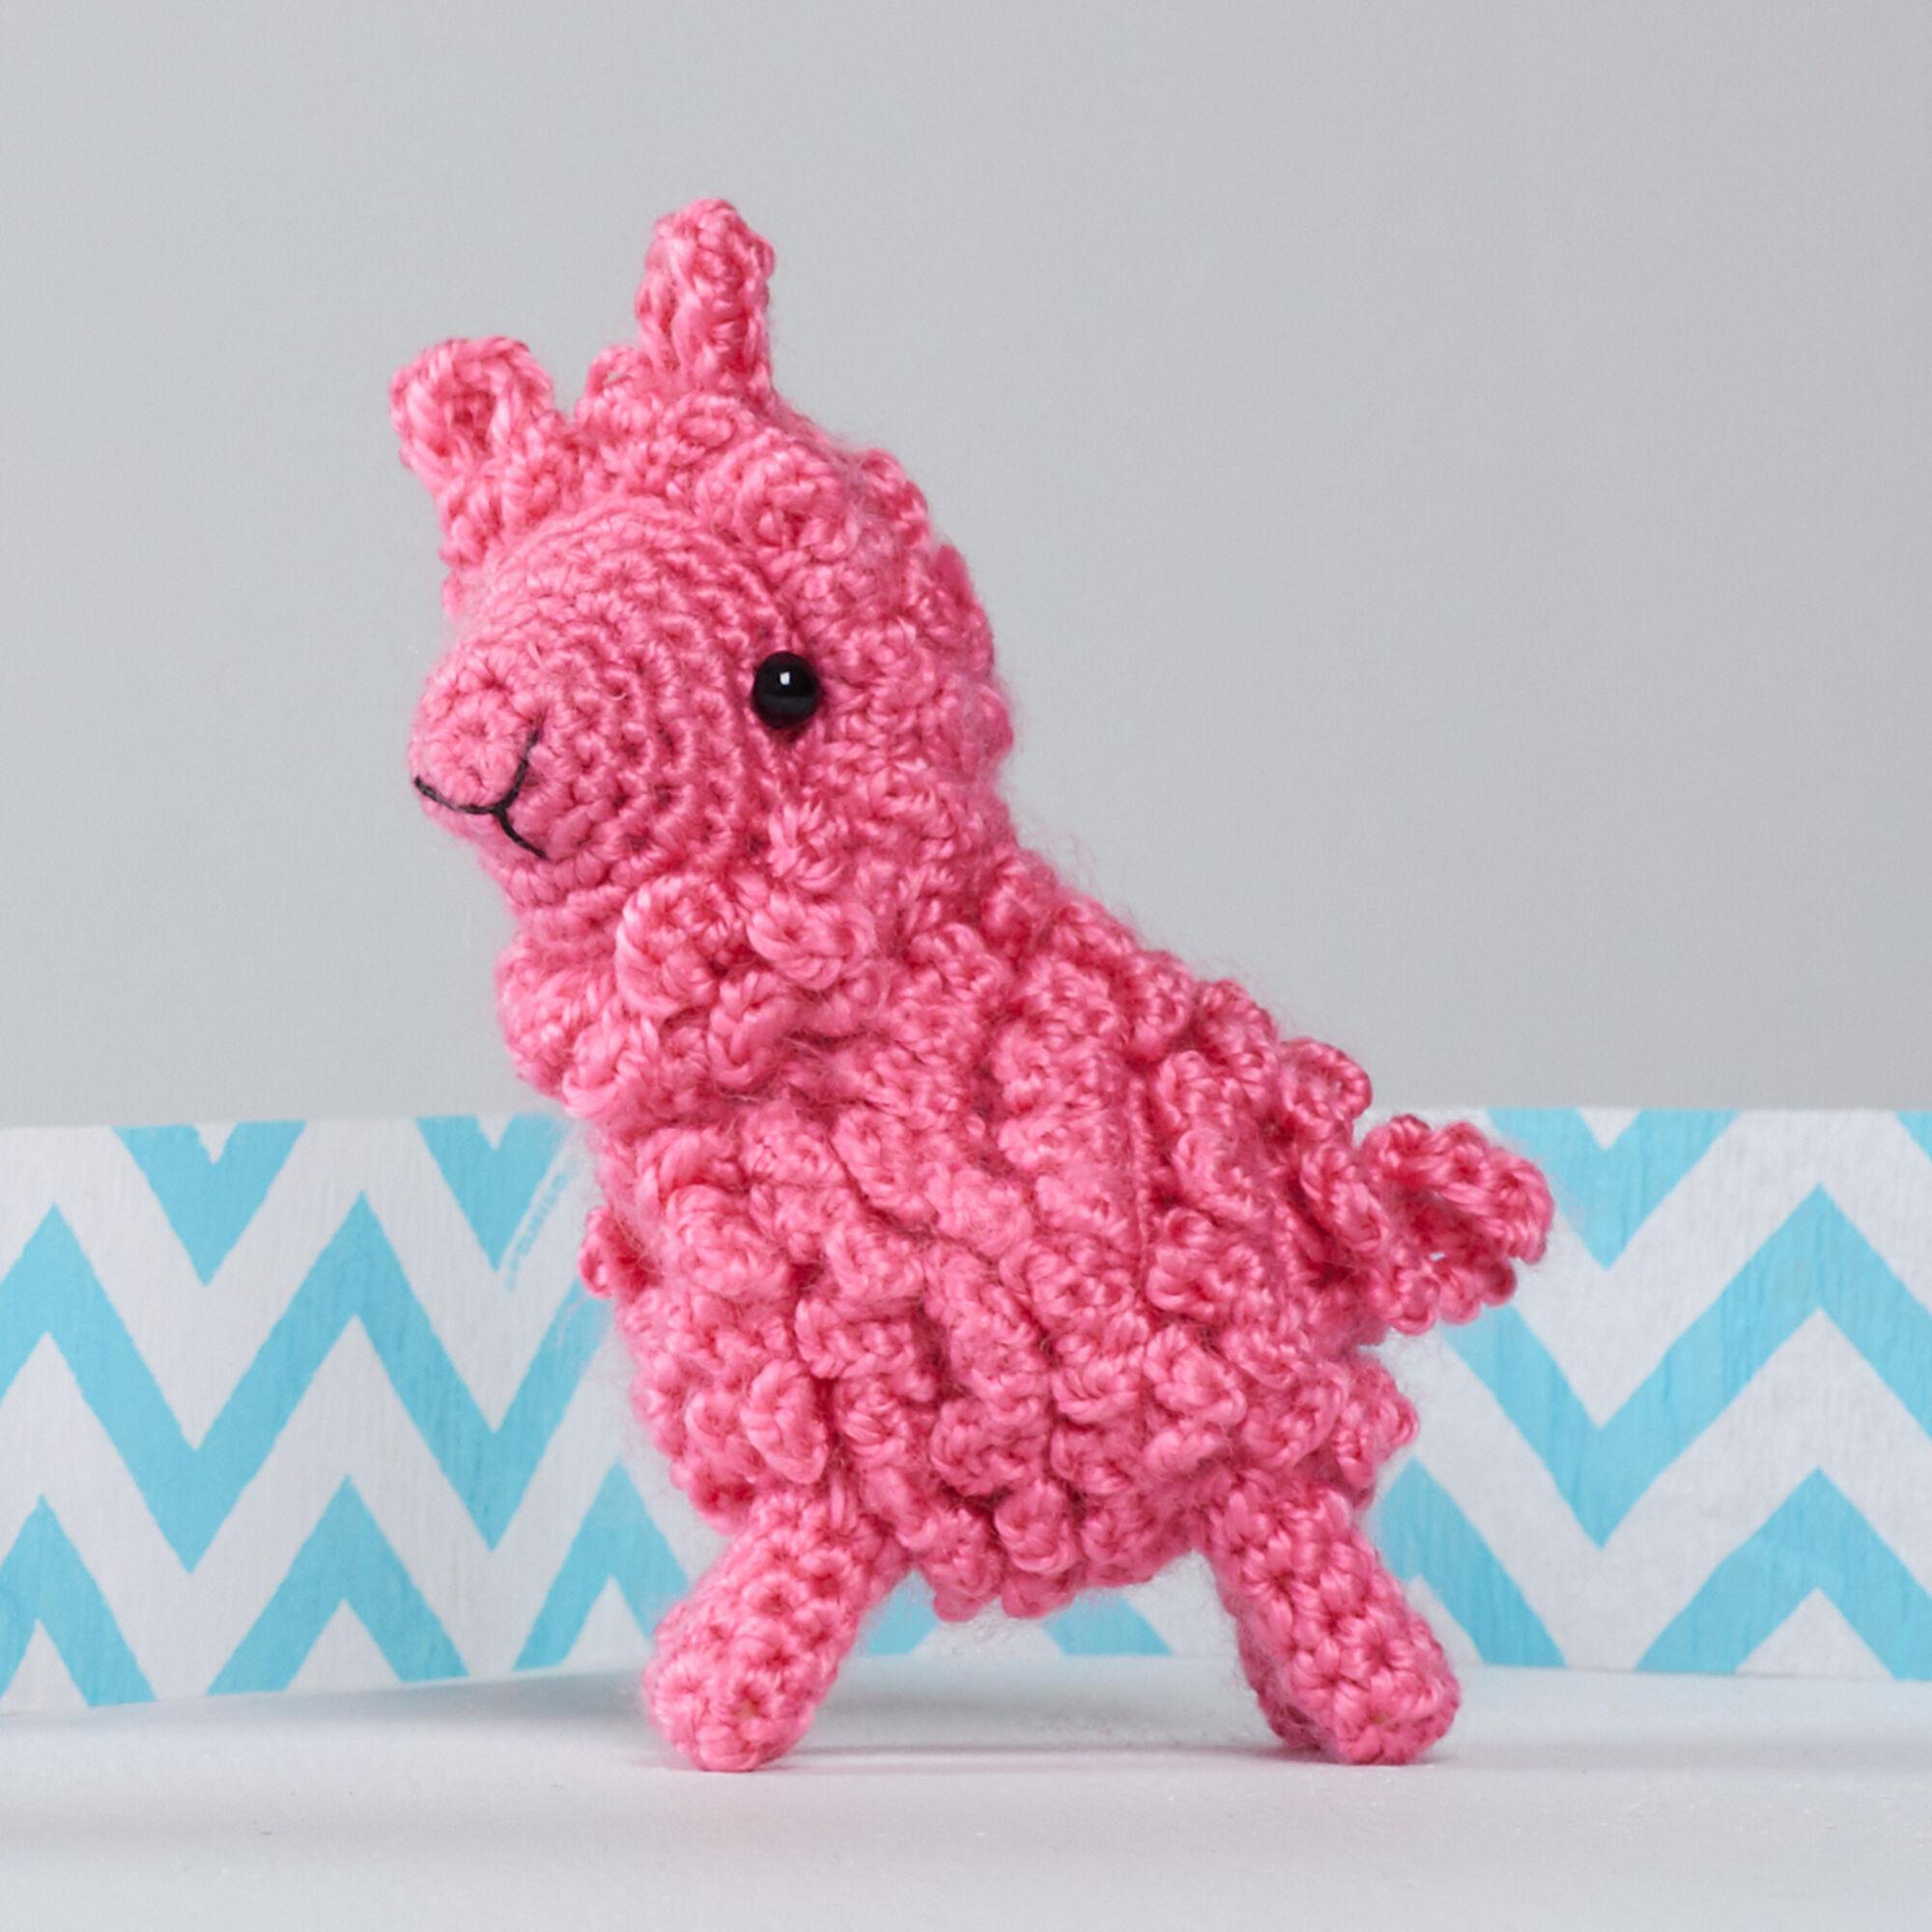 Unicorn crochet pattern, crochet unicorn, amigurumi, crochet ... | 2000x2000